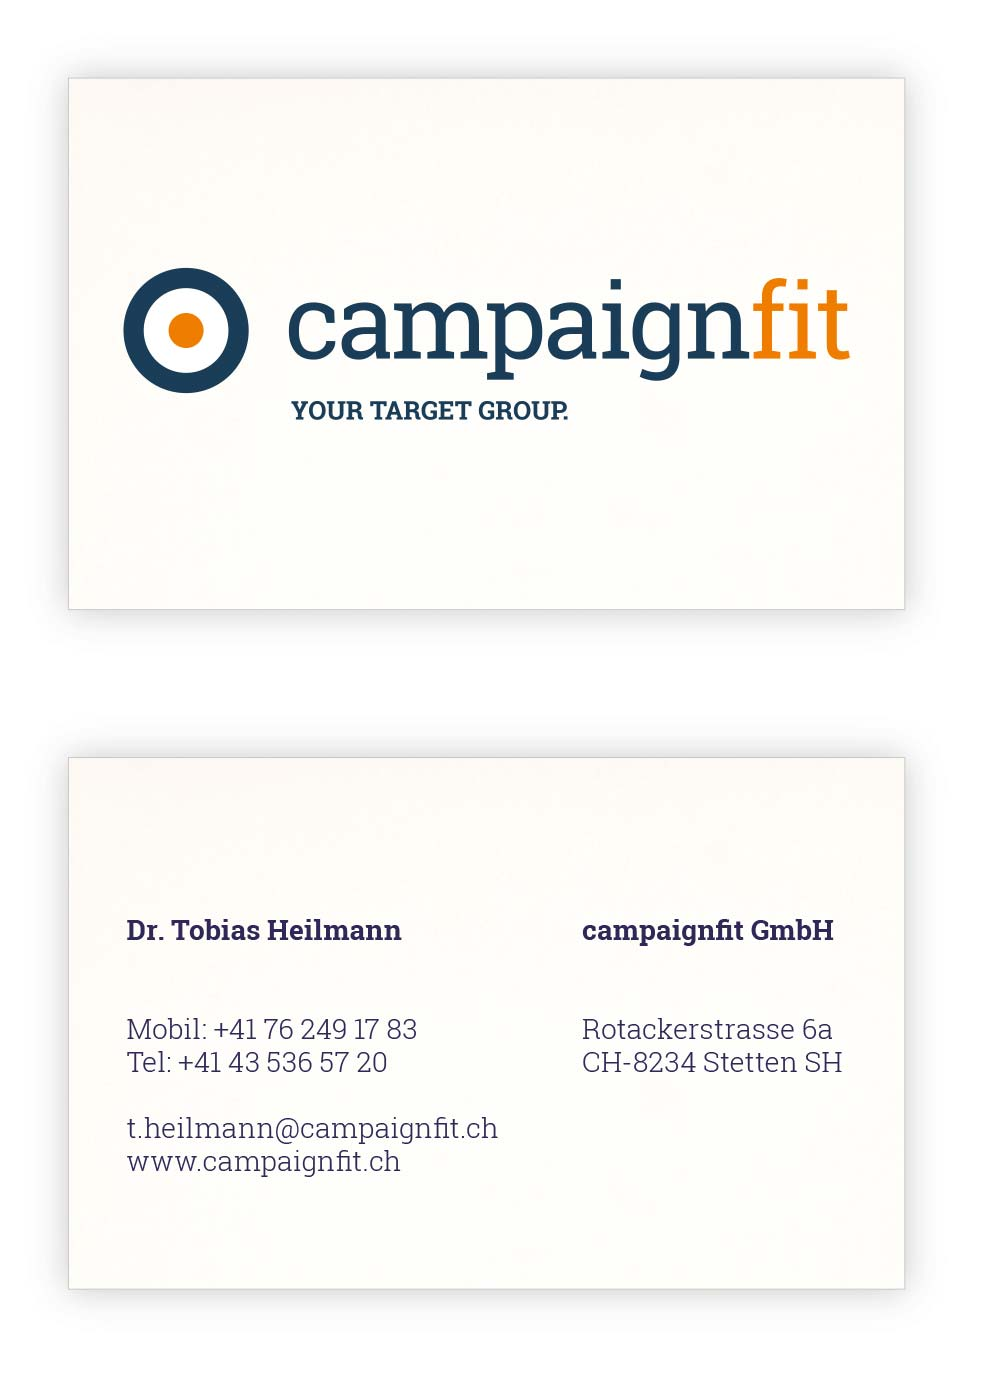 campaignfit CI